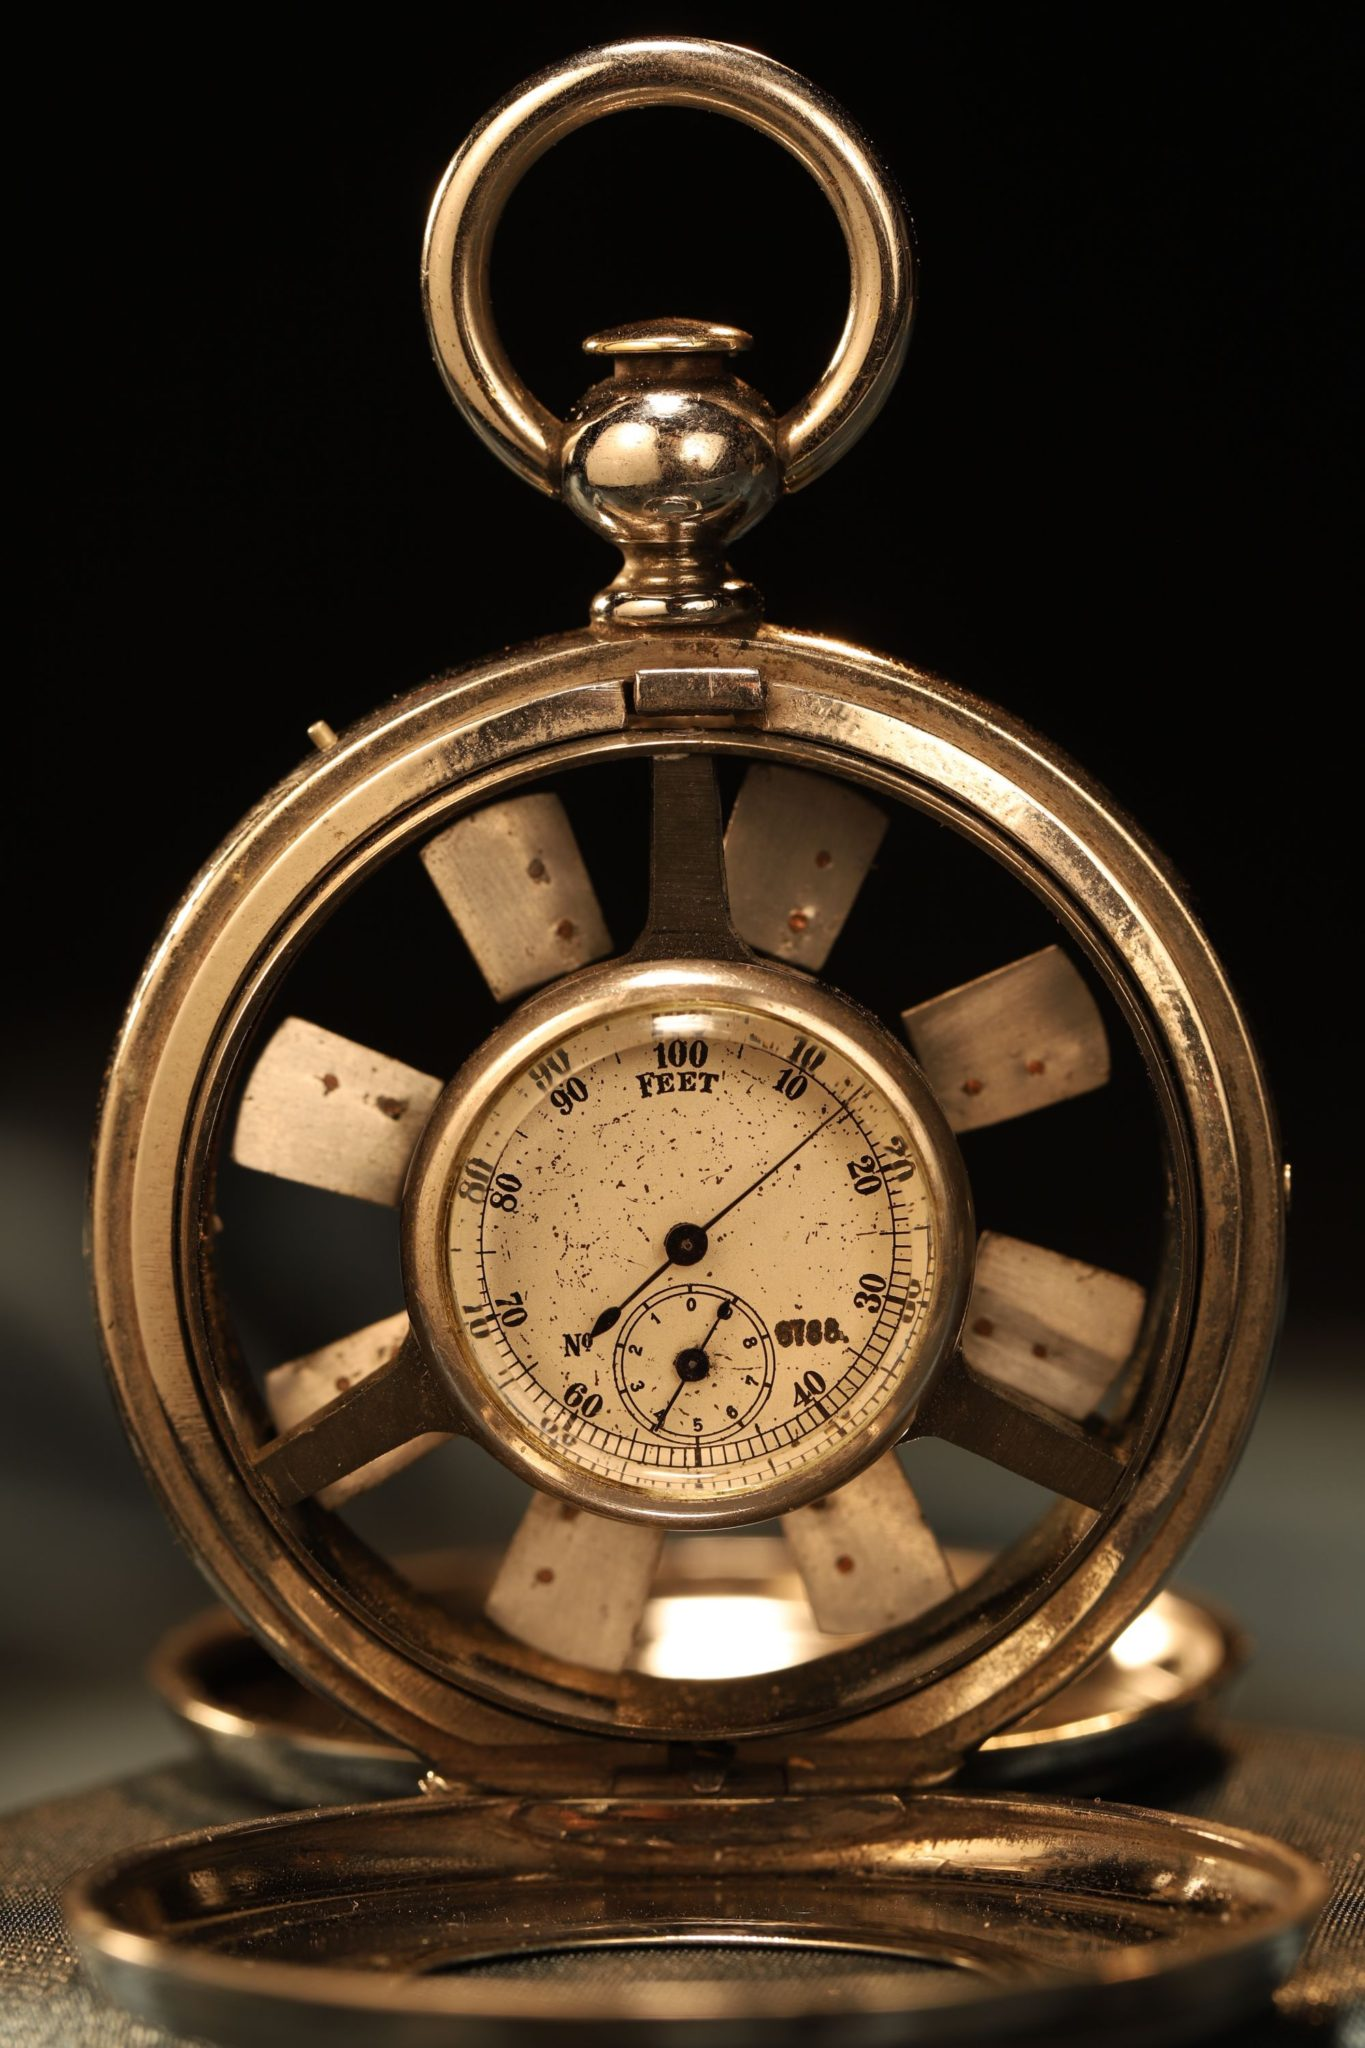 Image of Pocket Anemometer by Schaeffer & Budenberg No 6678 c1915